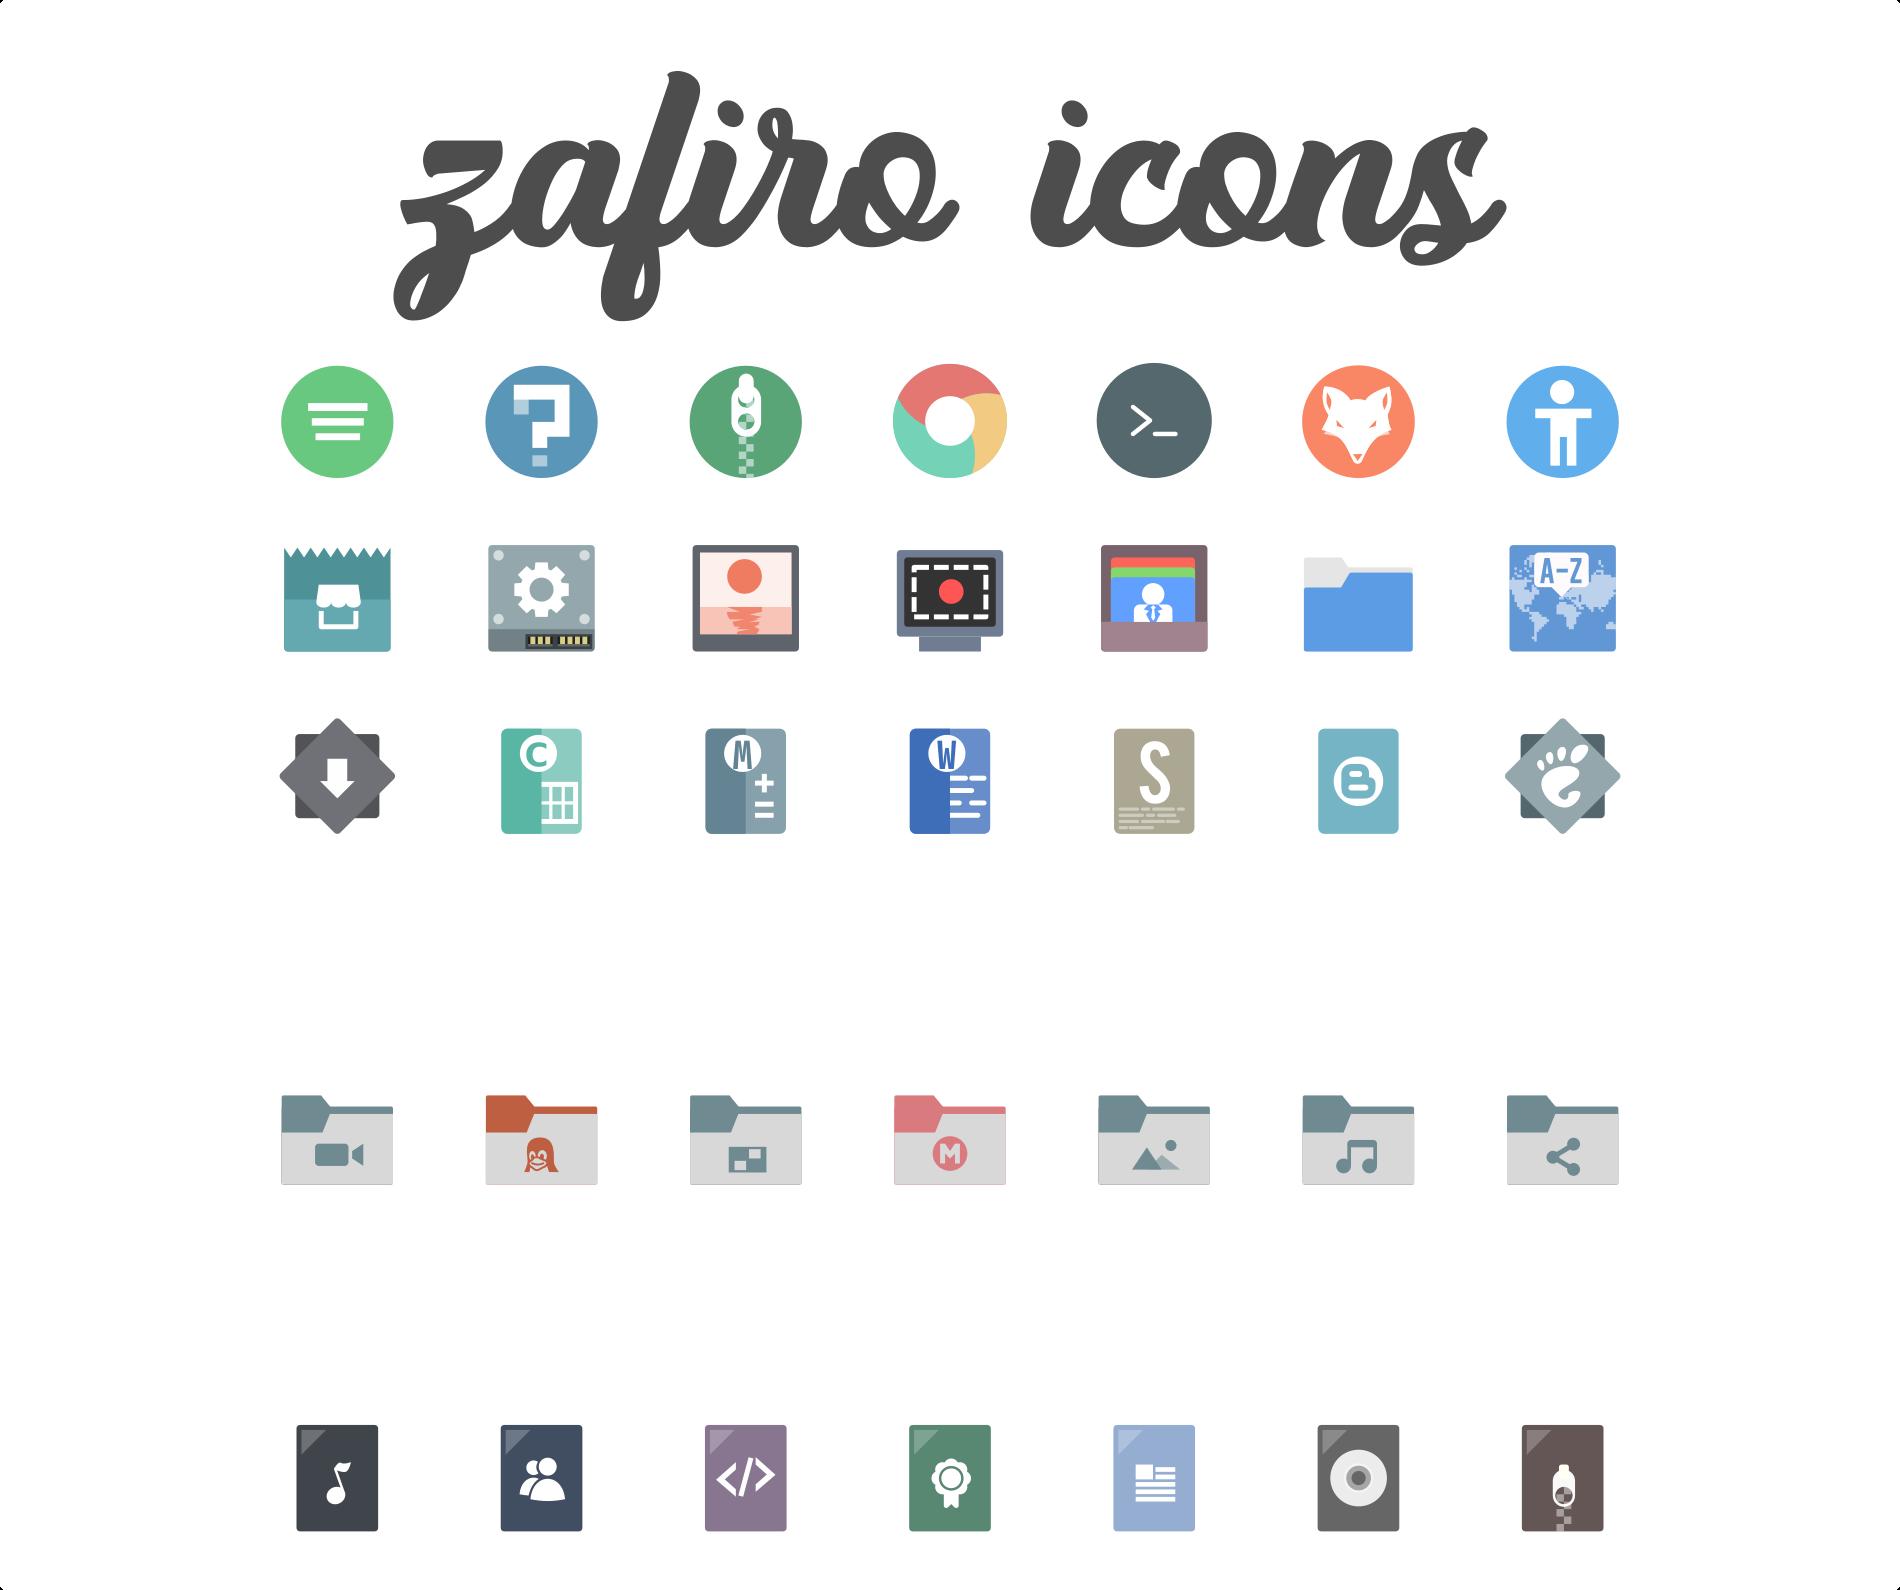 Zafiro icons 0.5